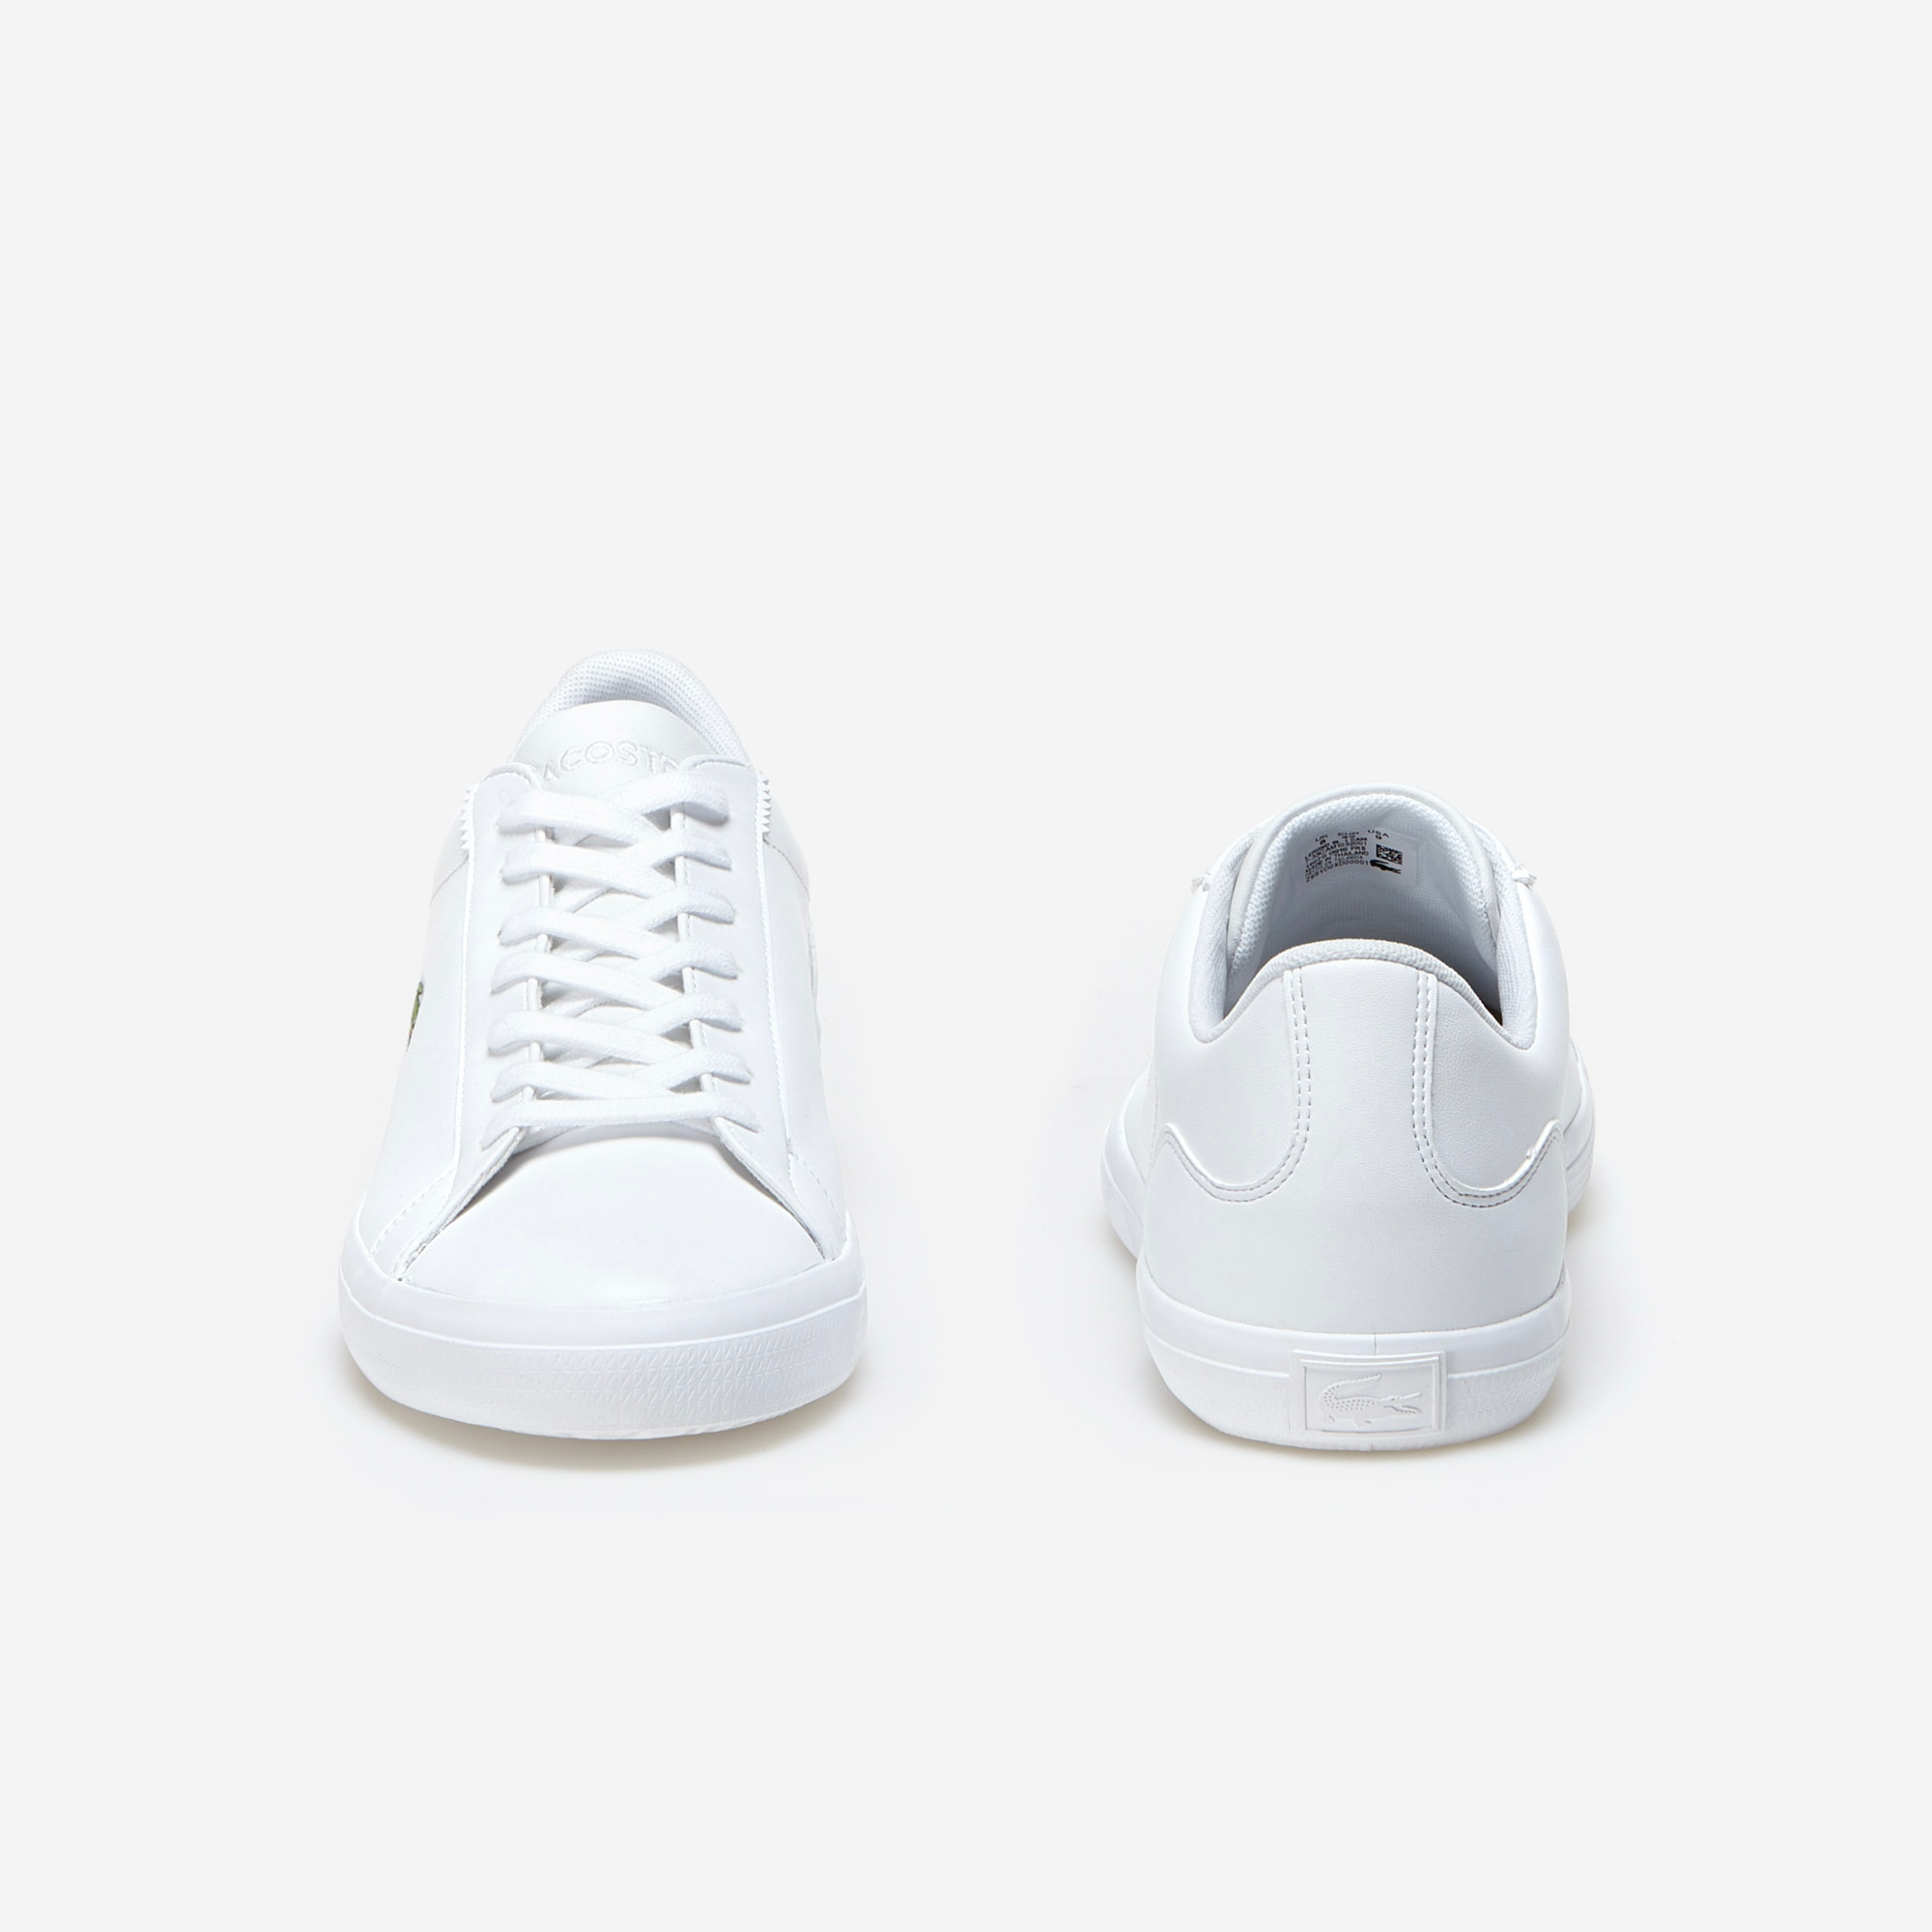 Lacoste - Herren-Sneakers LEROND aus einfarbigem Leder - 5